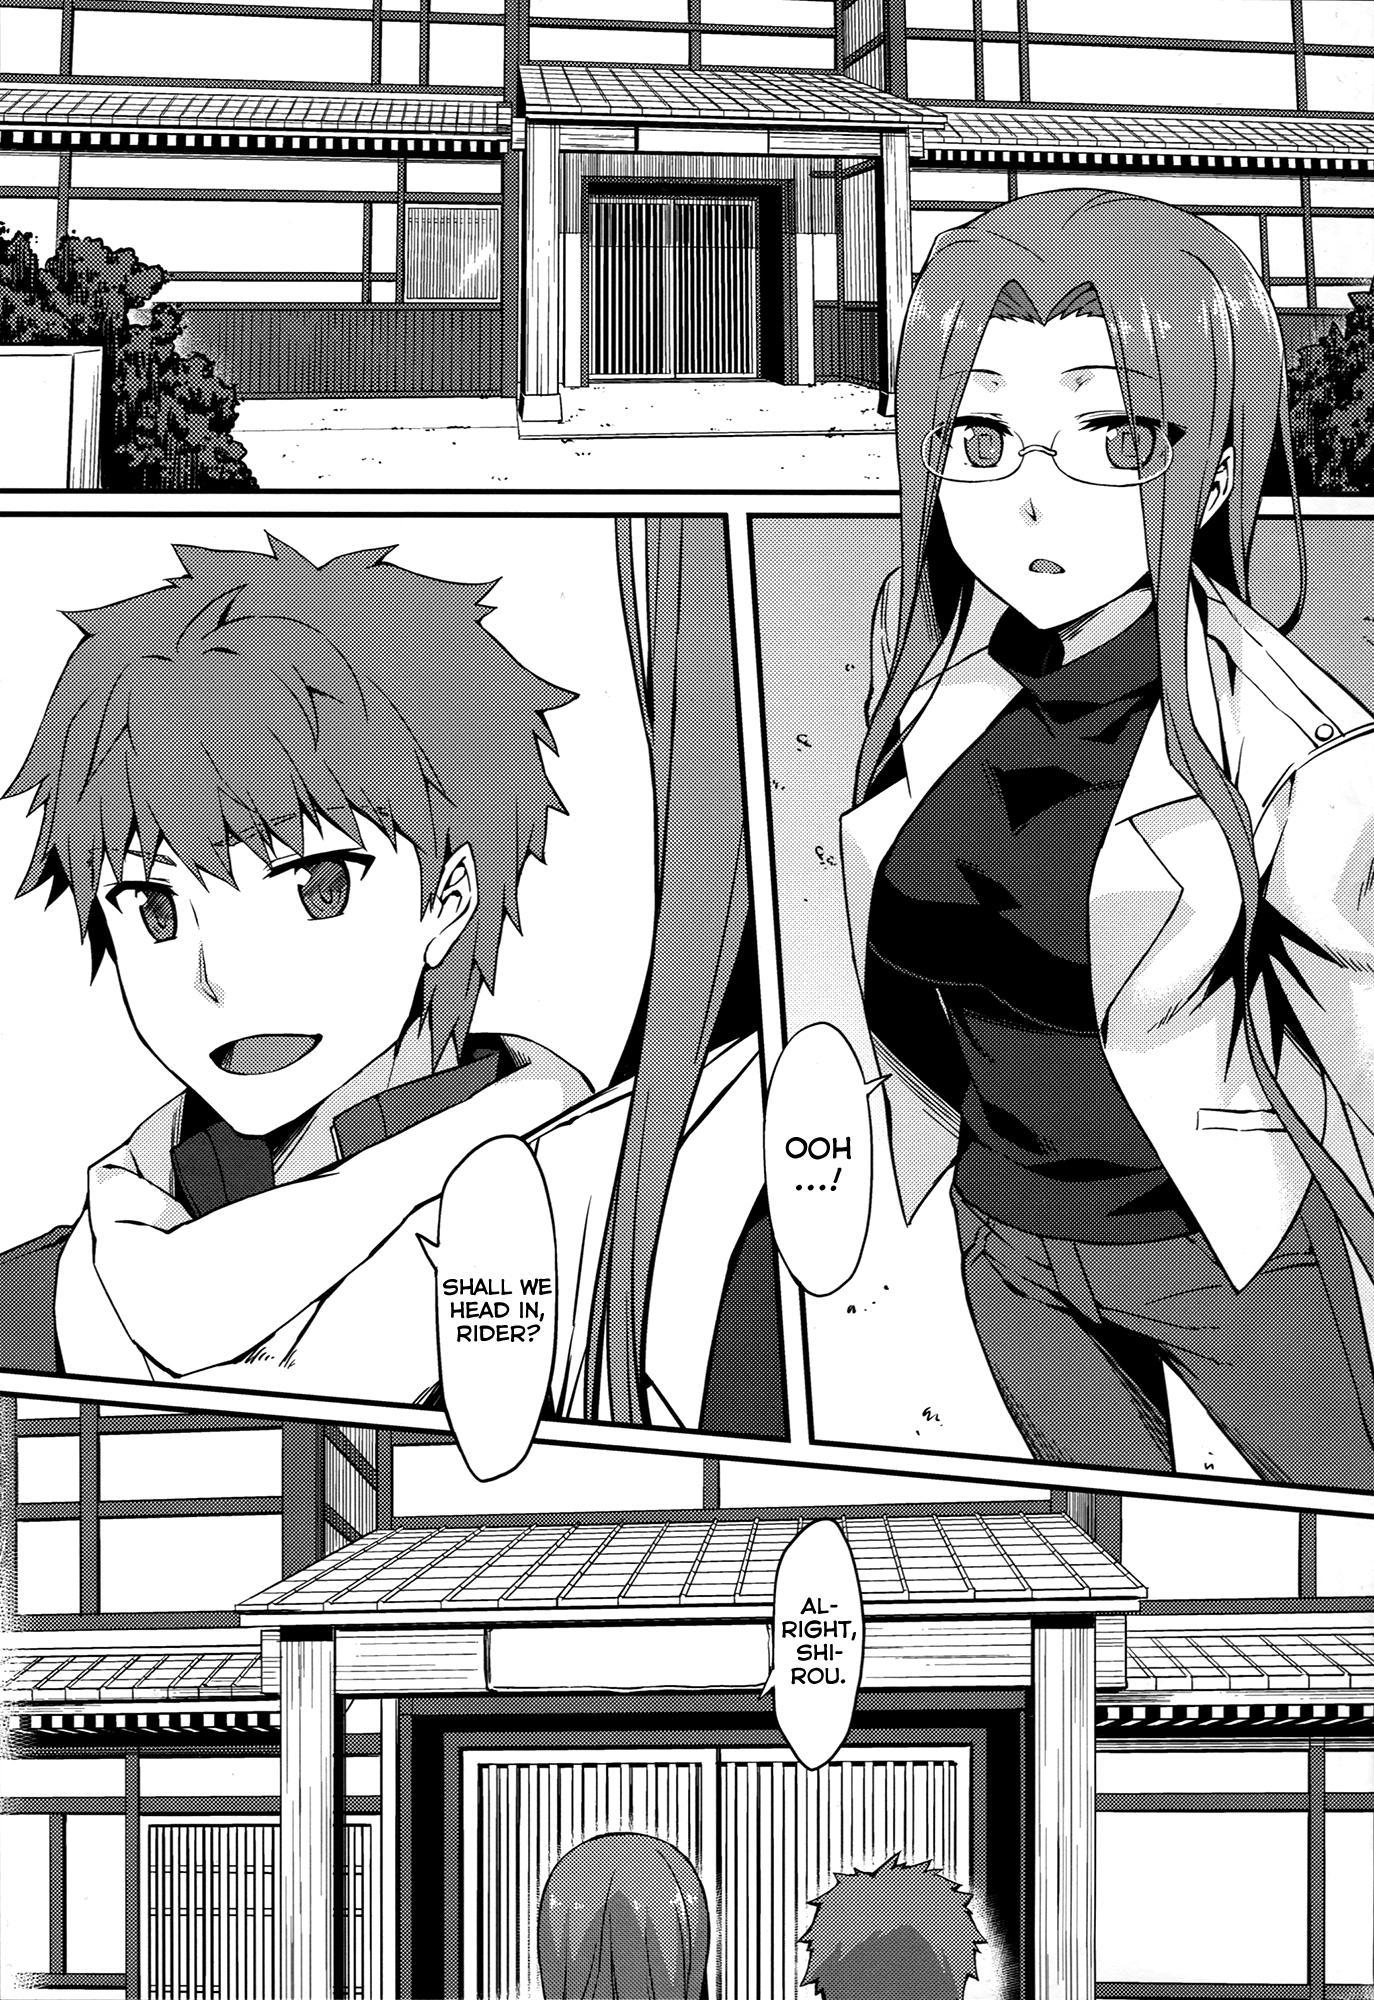 (C87) [S.S.L (Yanagi)] Rider-san to Onsen Yado. | Hot Spring Inn With Rider-san. (Fate/stay night) [English] [Facedesk] 1